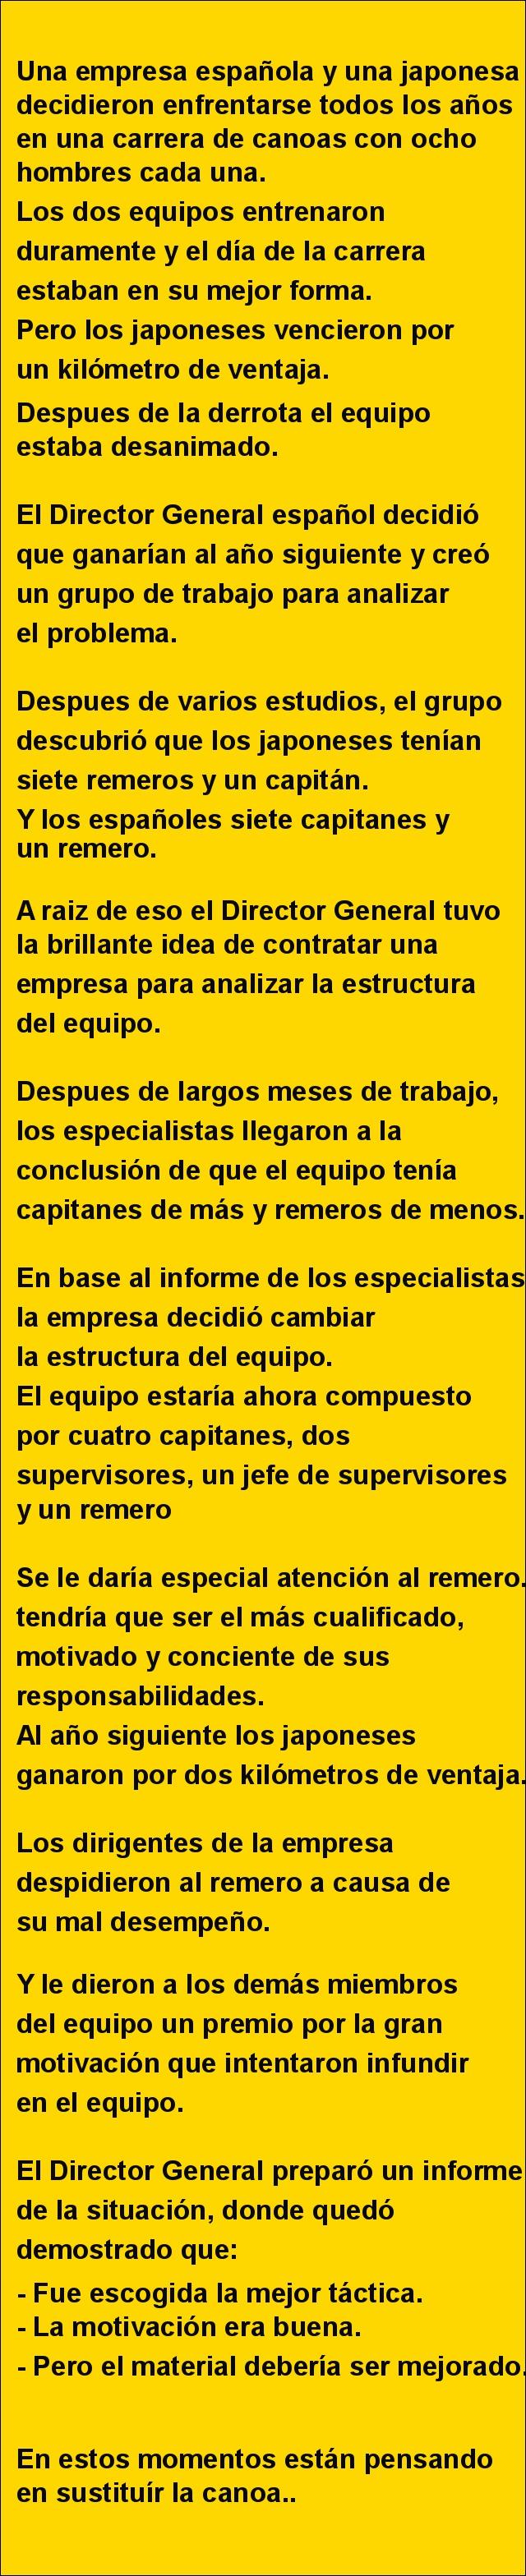 http://topera.es/upload/a22ebf690a9b56641c0c805fa145caa8.jpg